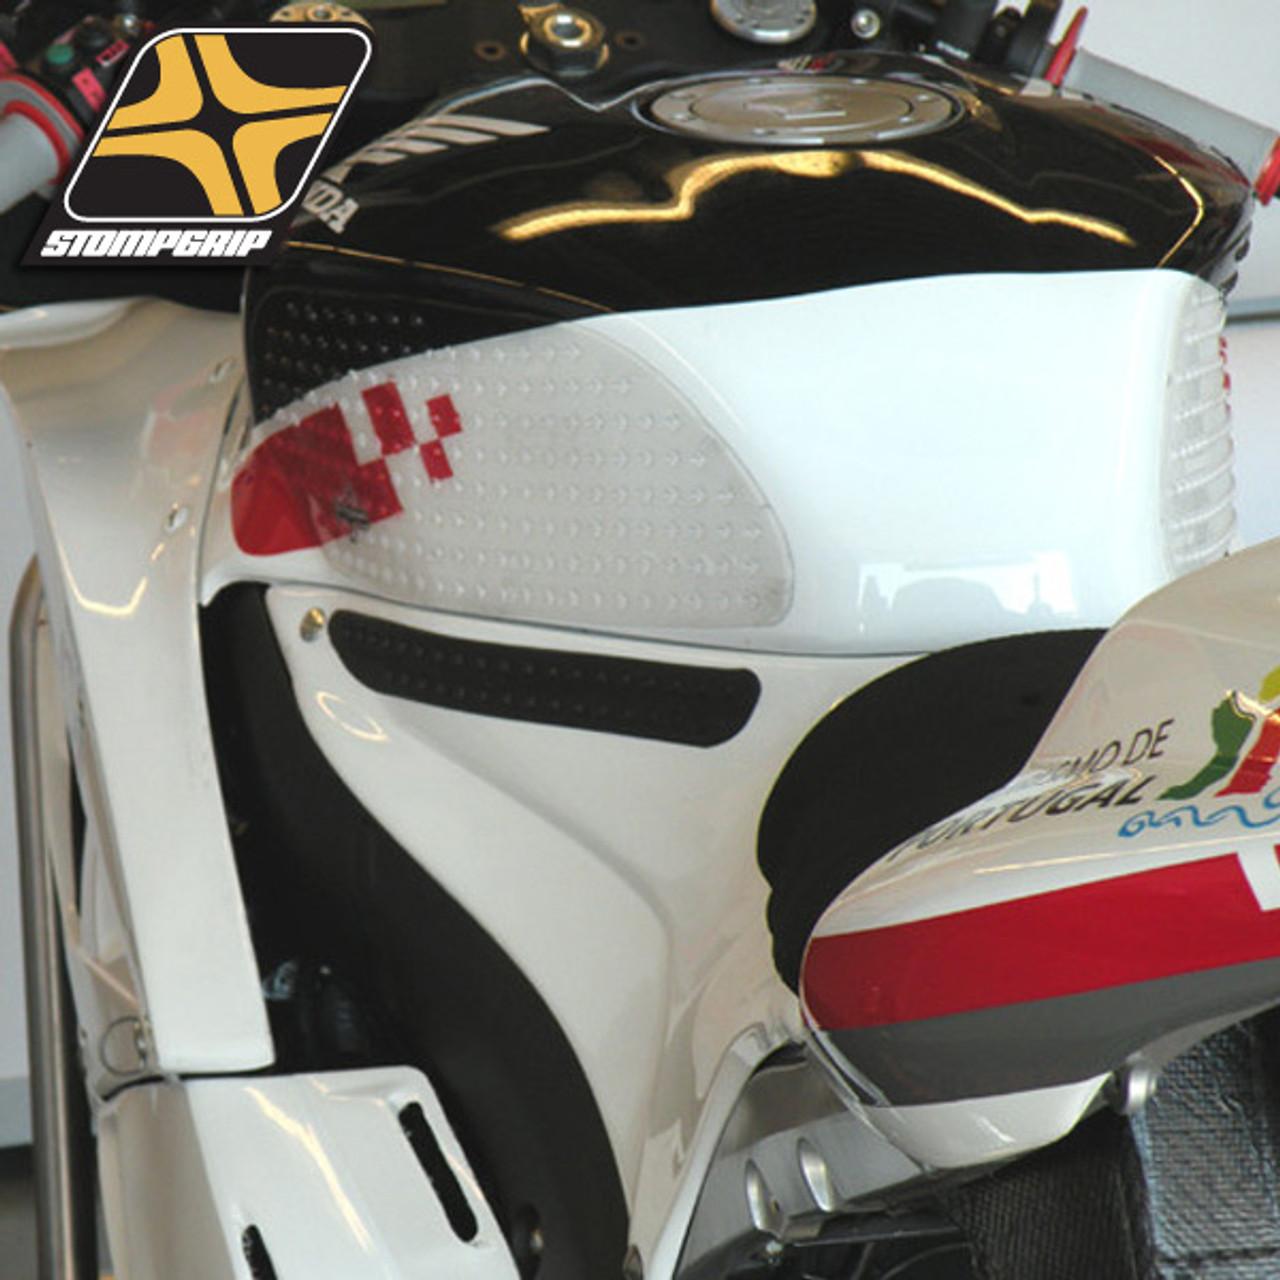 TANK PAD STOMPGRIP per Honda cbr600rr 2007-2012